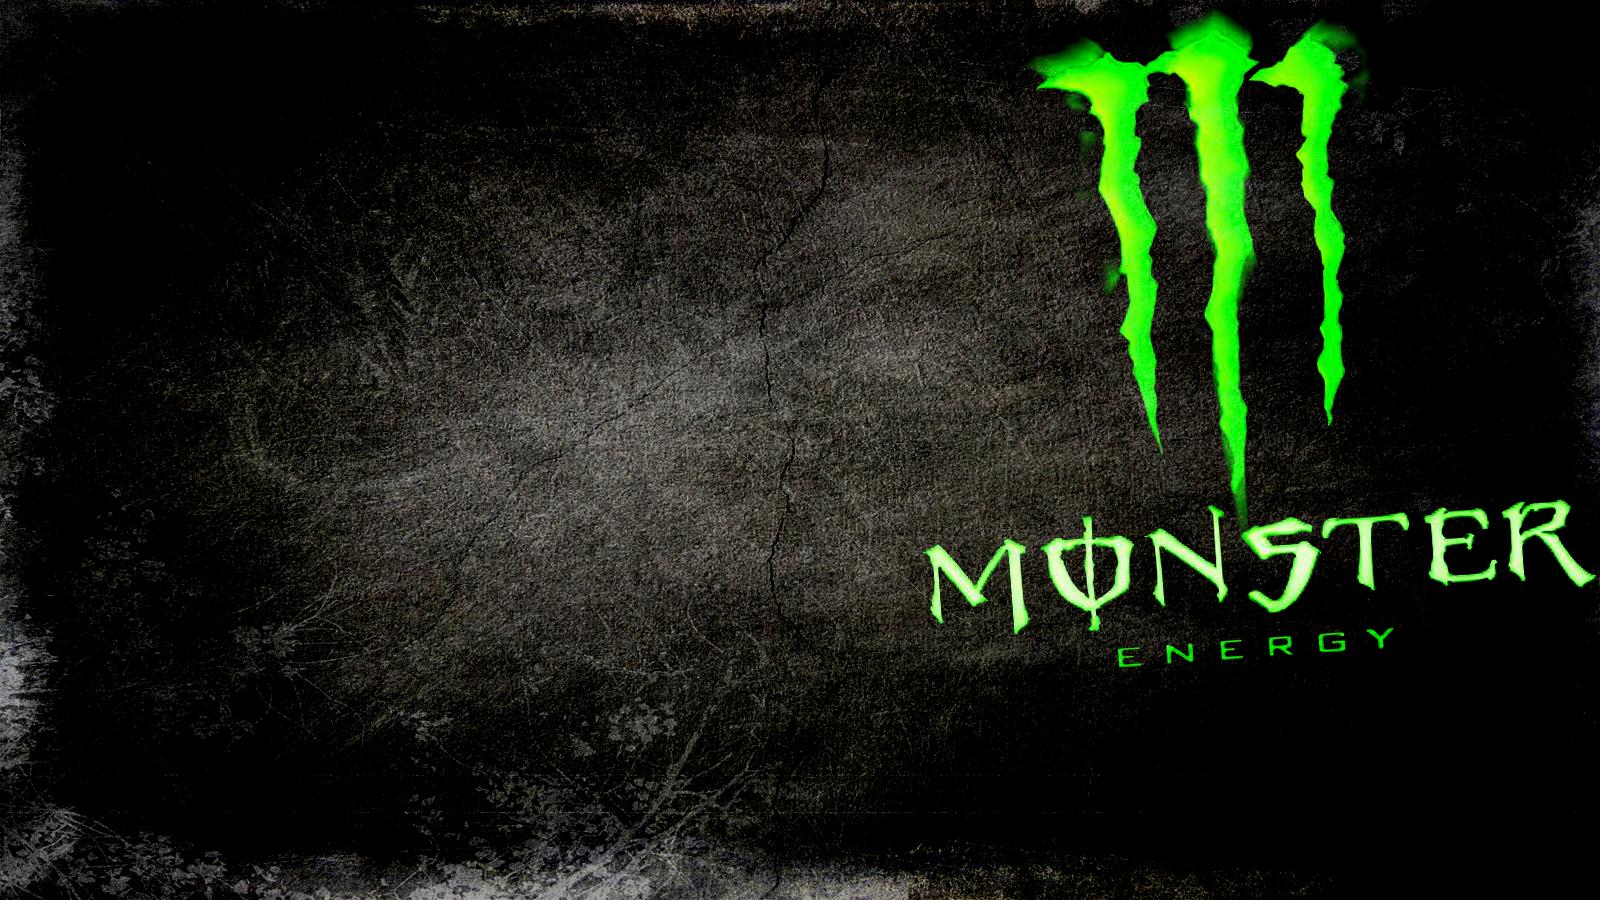 wallpapers de monster energy gratis descarga directa monster energy 1600x900